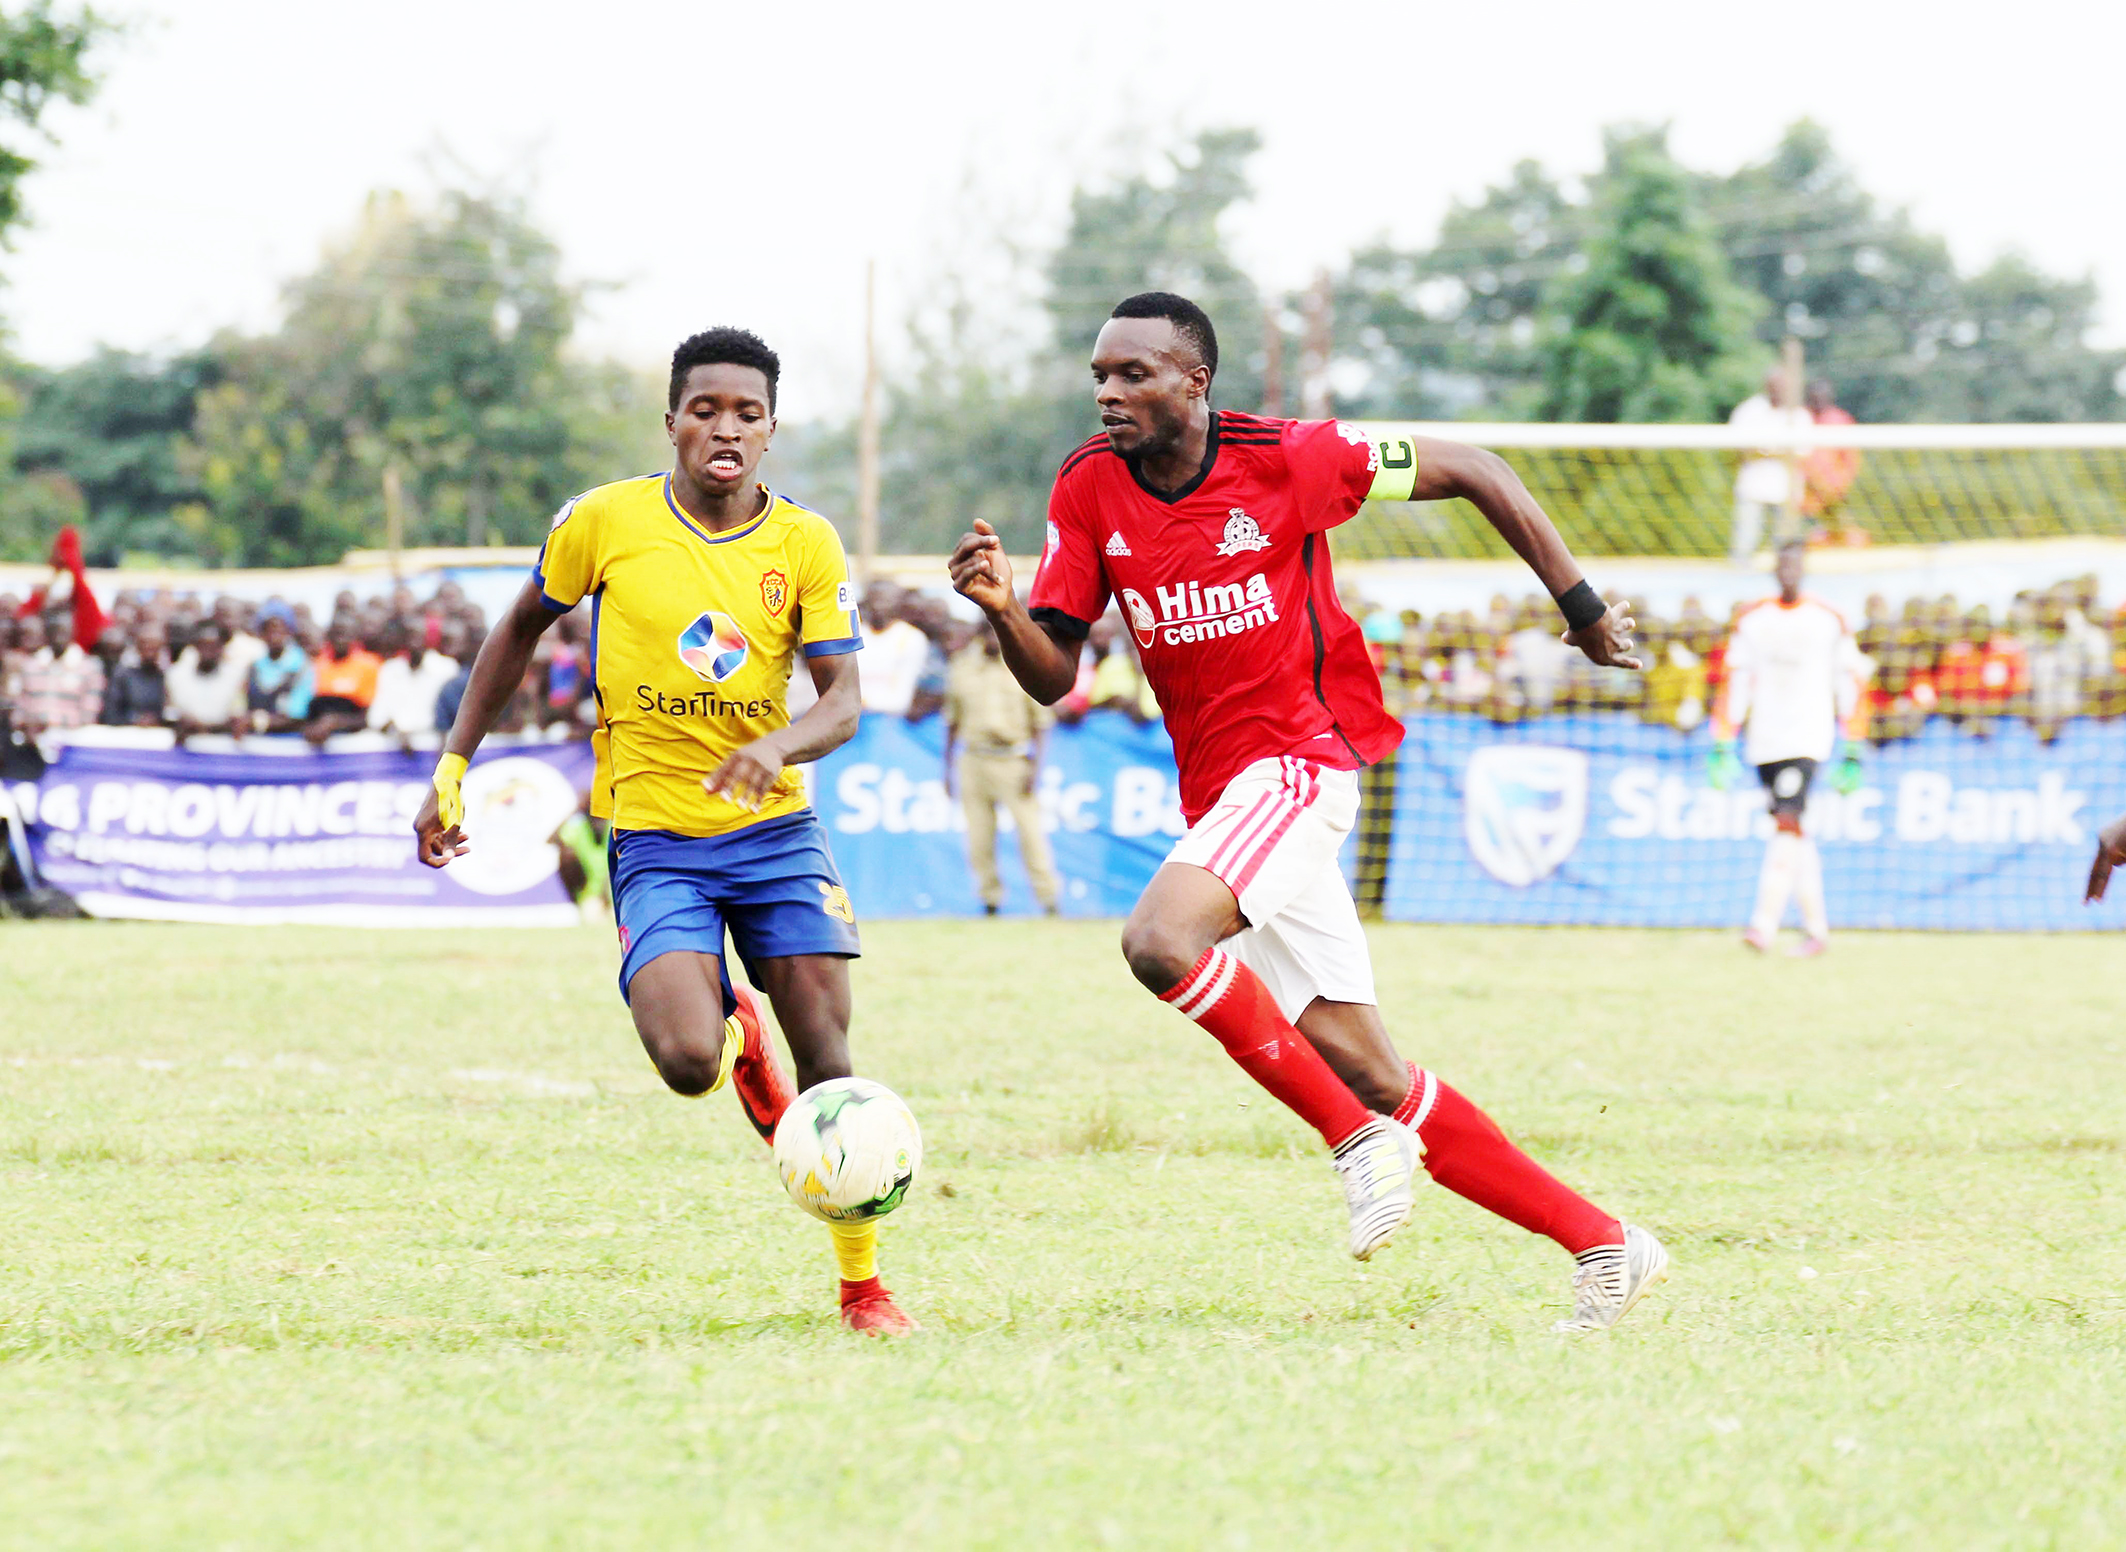 Full Uganda Premier League 2018/19 analysis: The contenders